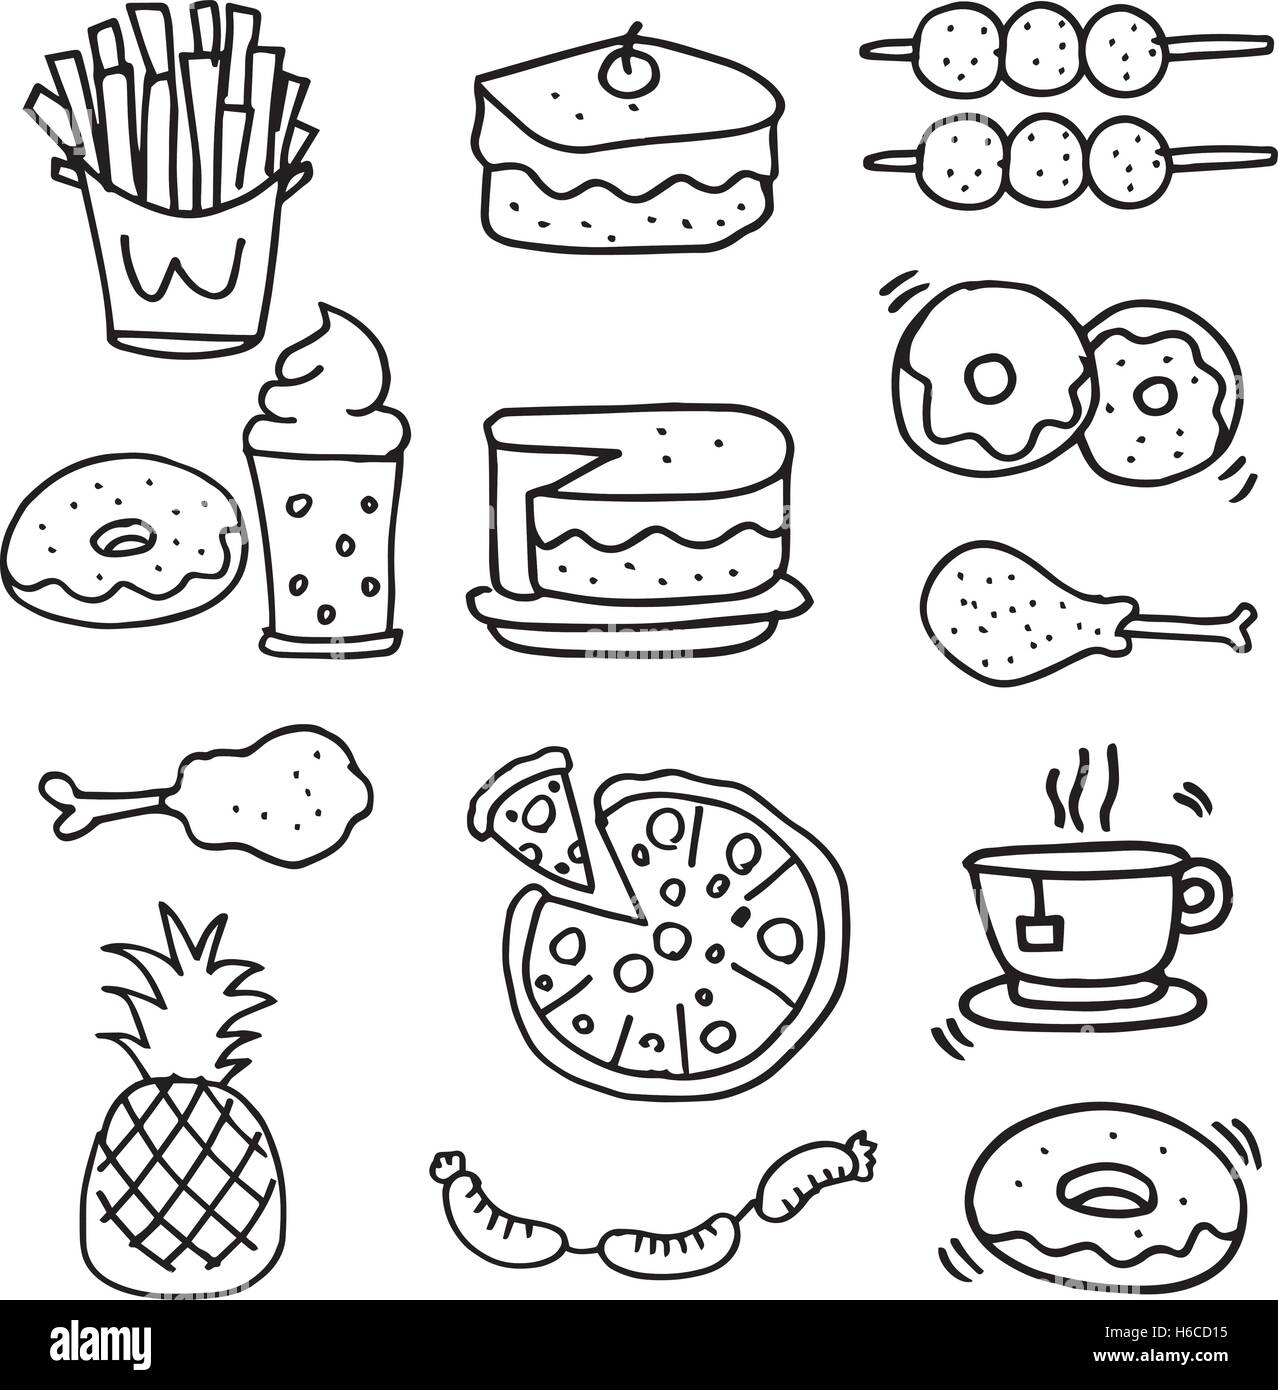 Shopping Food Plate Worksheet